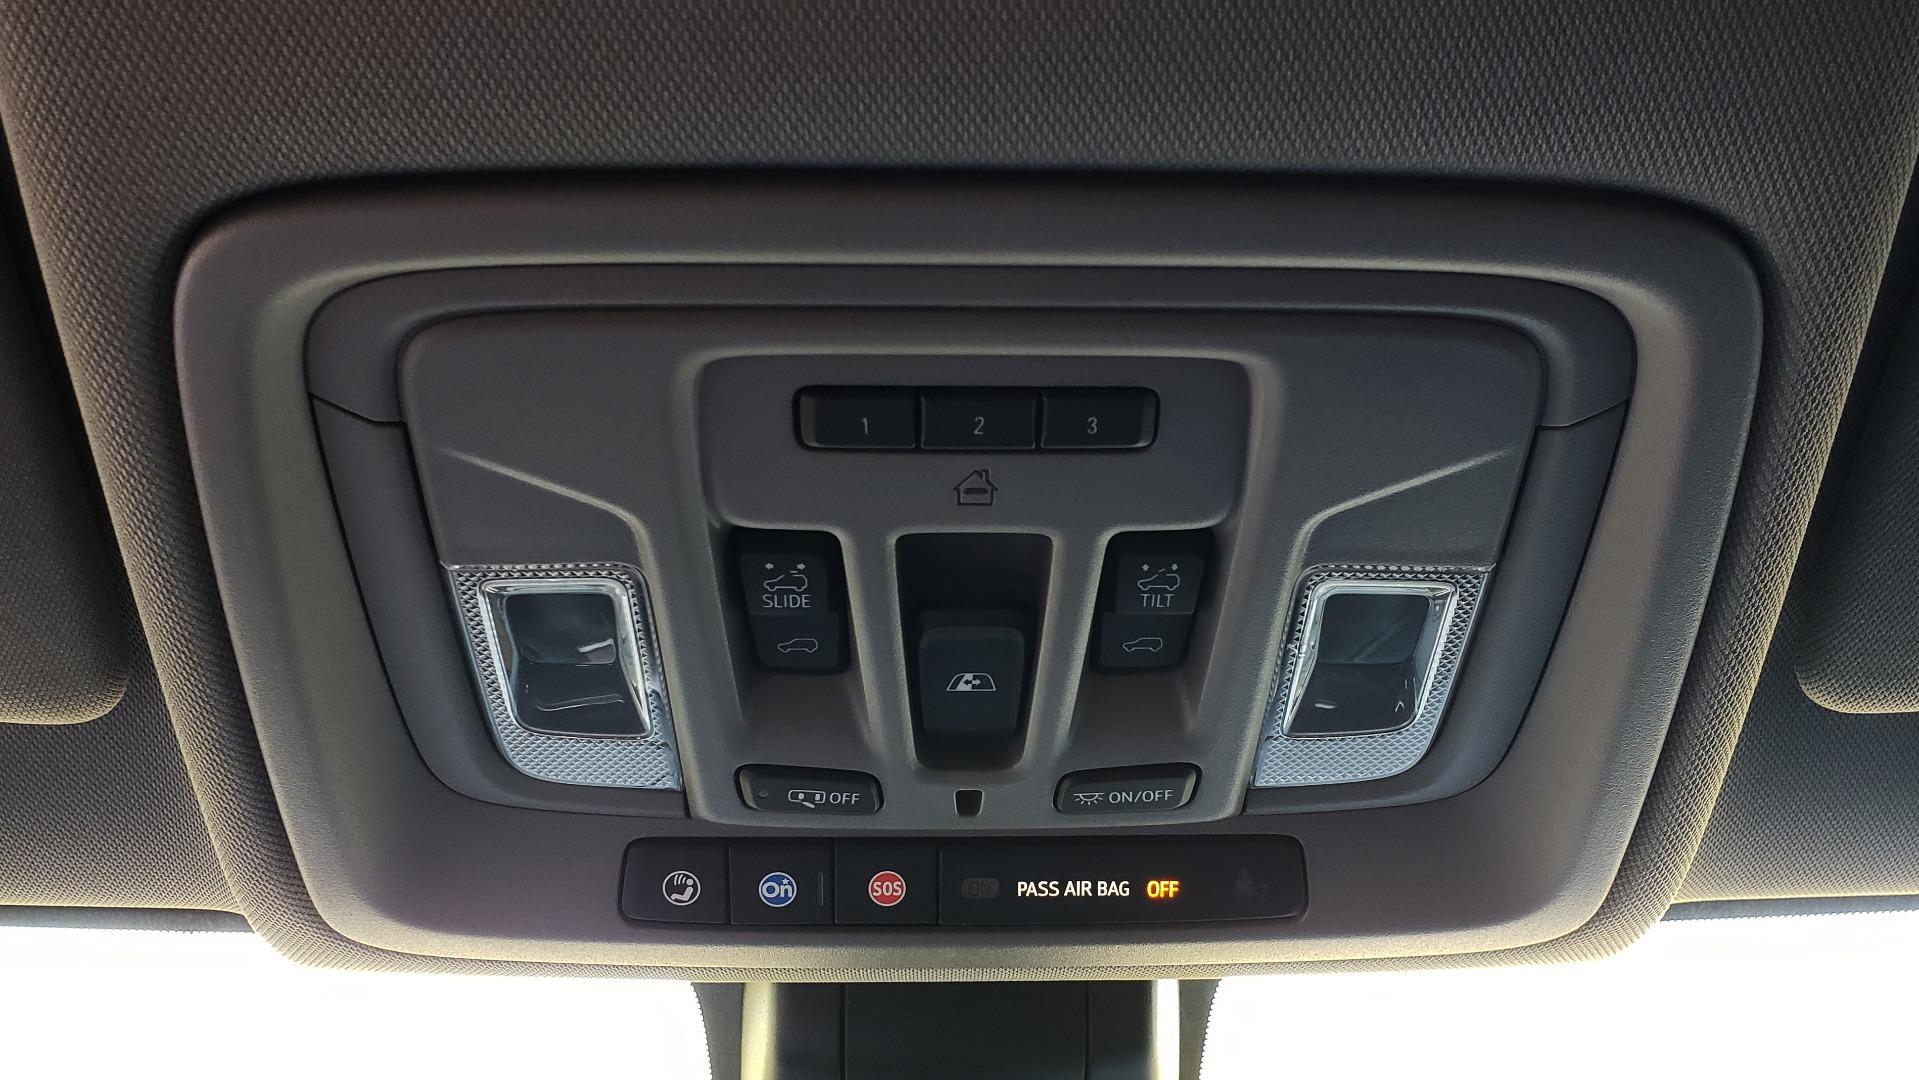 Used 2019 GMC SIERRA 1500 DENALI ULTIMATE 4WD / NAV / TECH PKG / DRVR ALRT for sale Sold at Formula Imports in Charlotte NC 28227 60